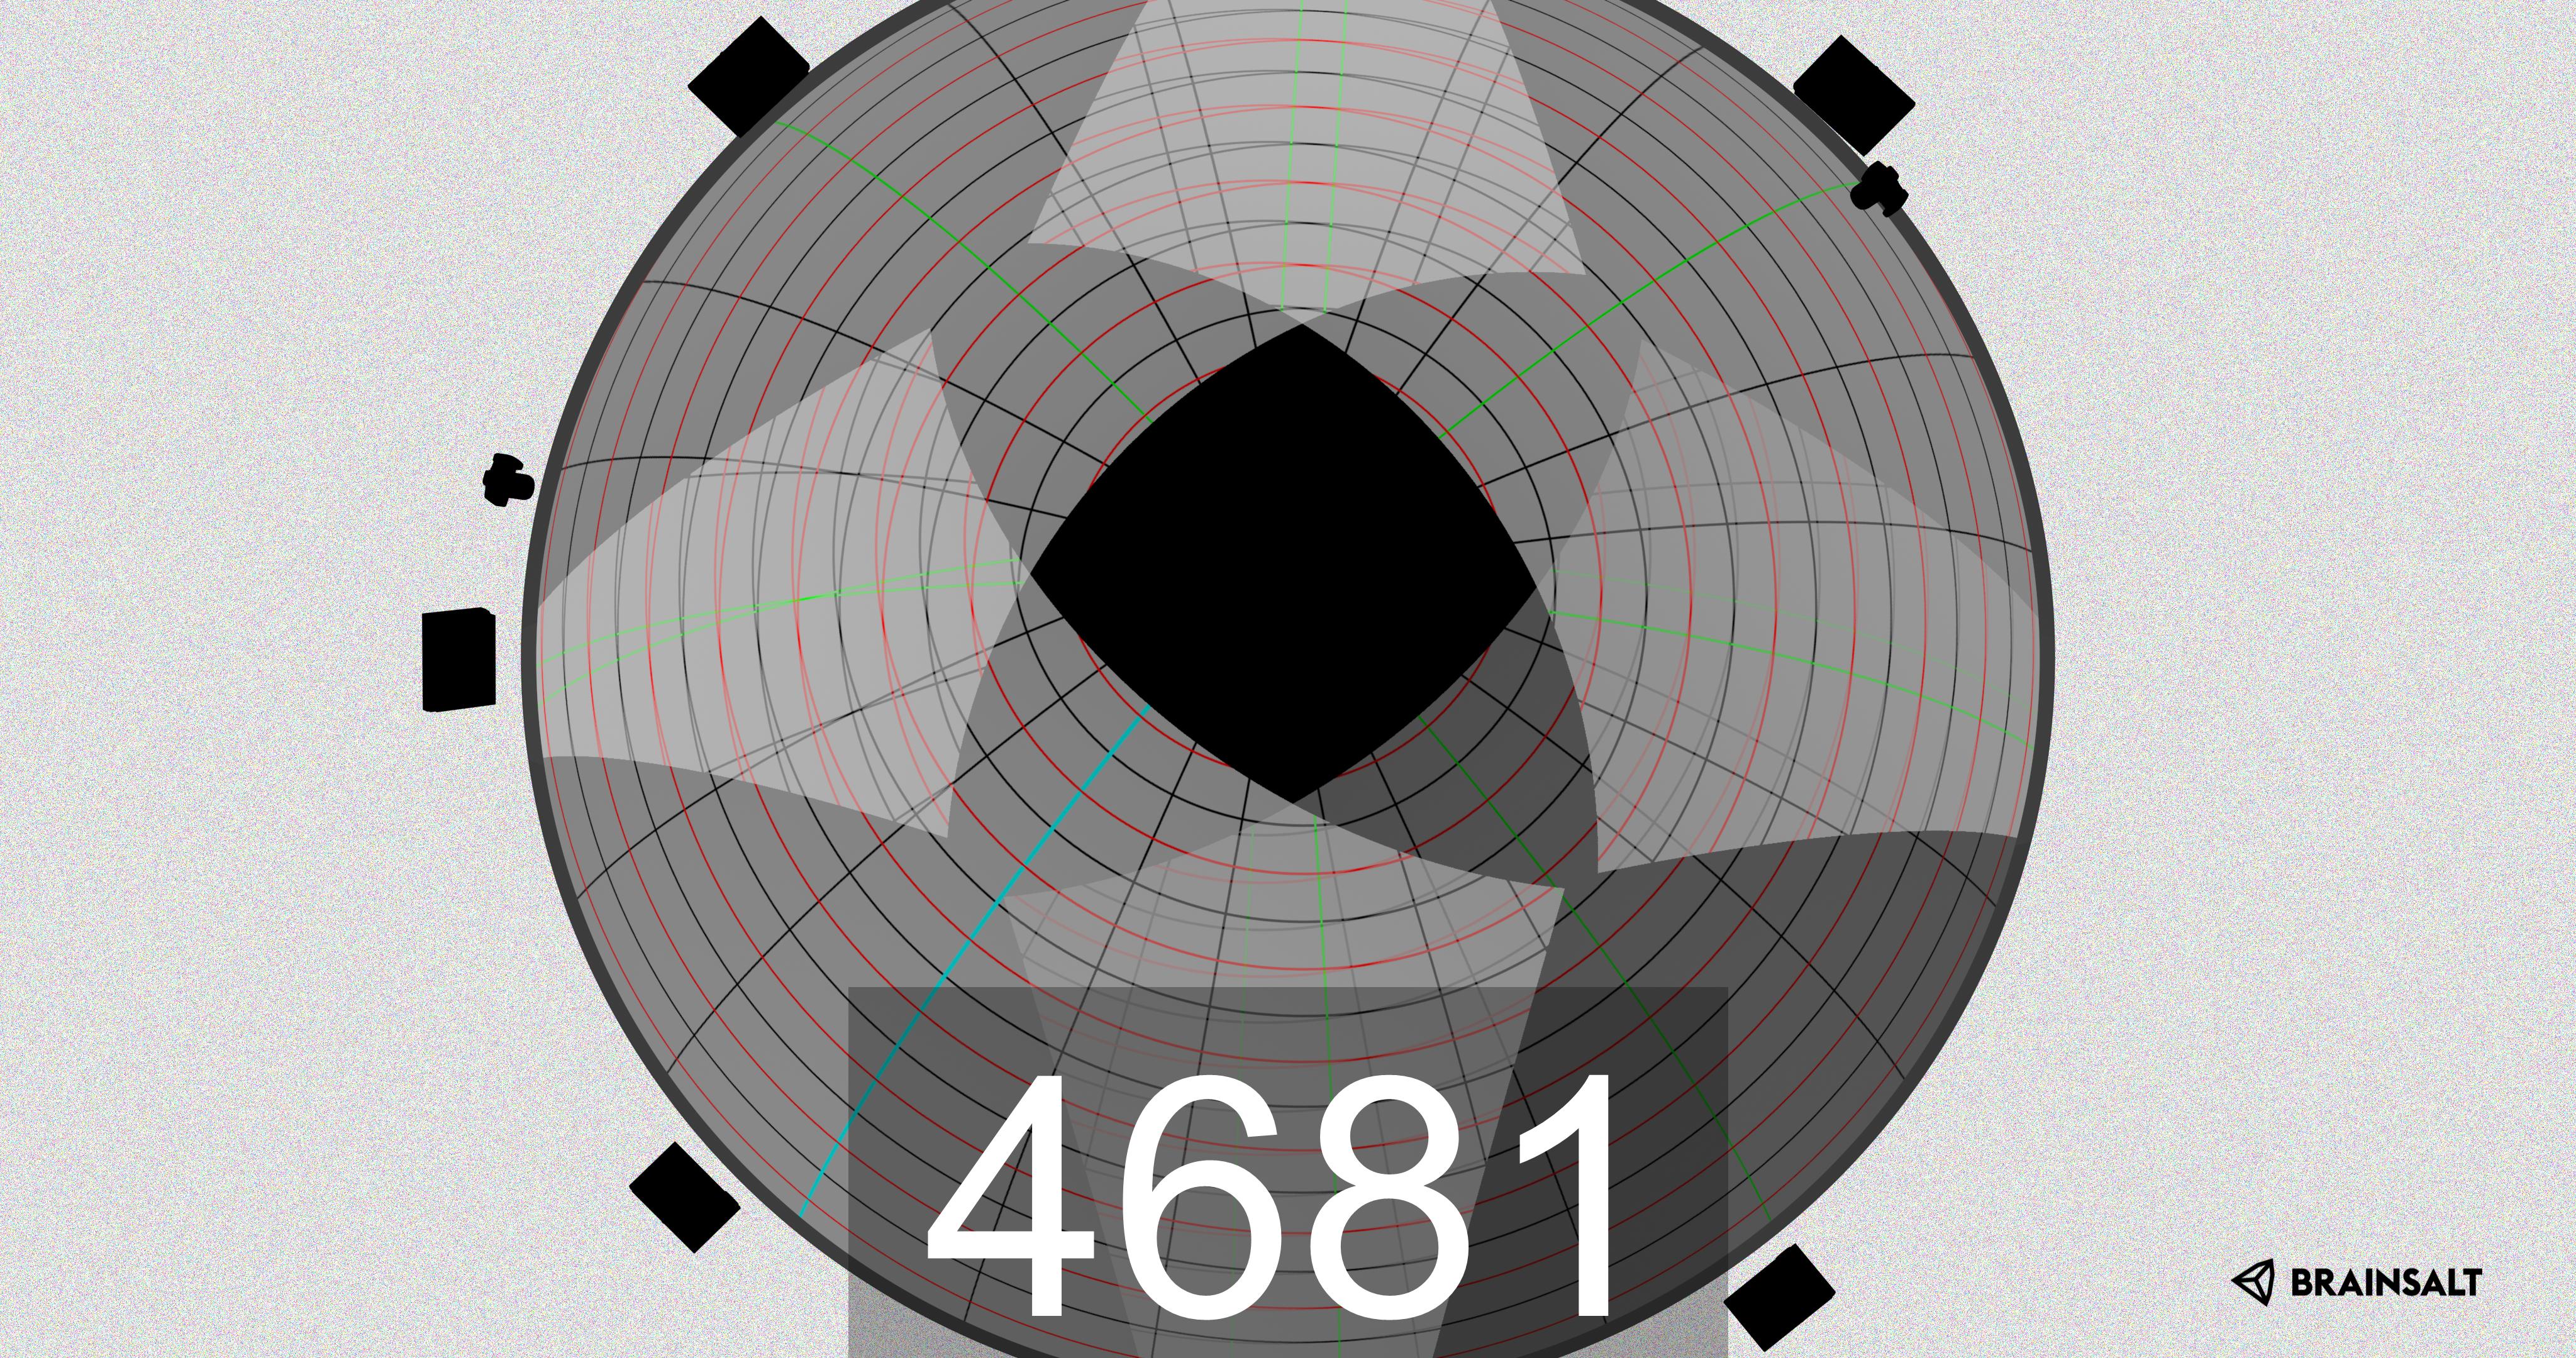 120 FPS Uncompressed 4K Video Playback